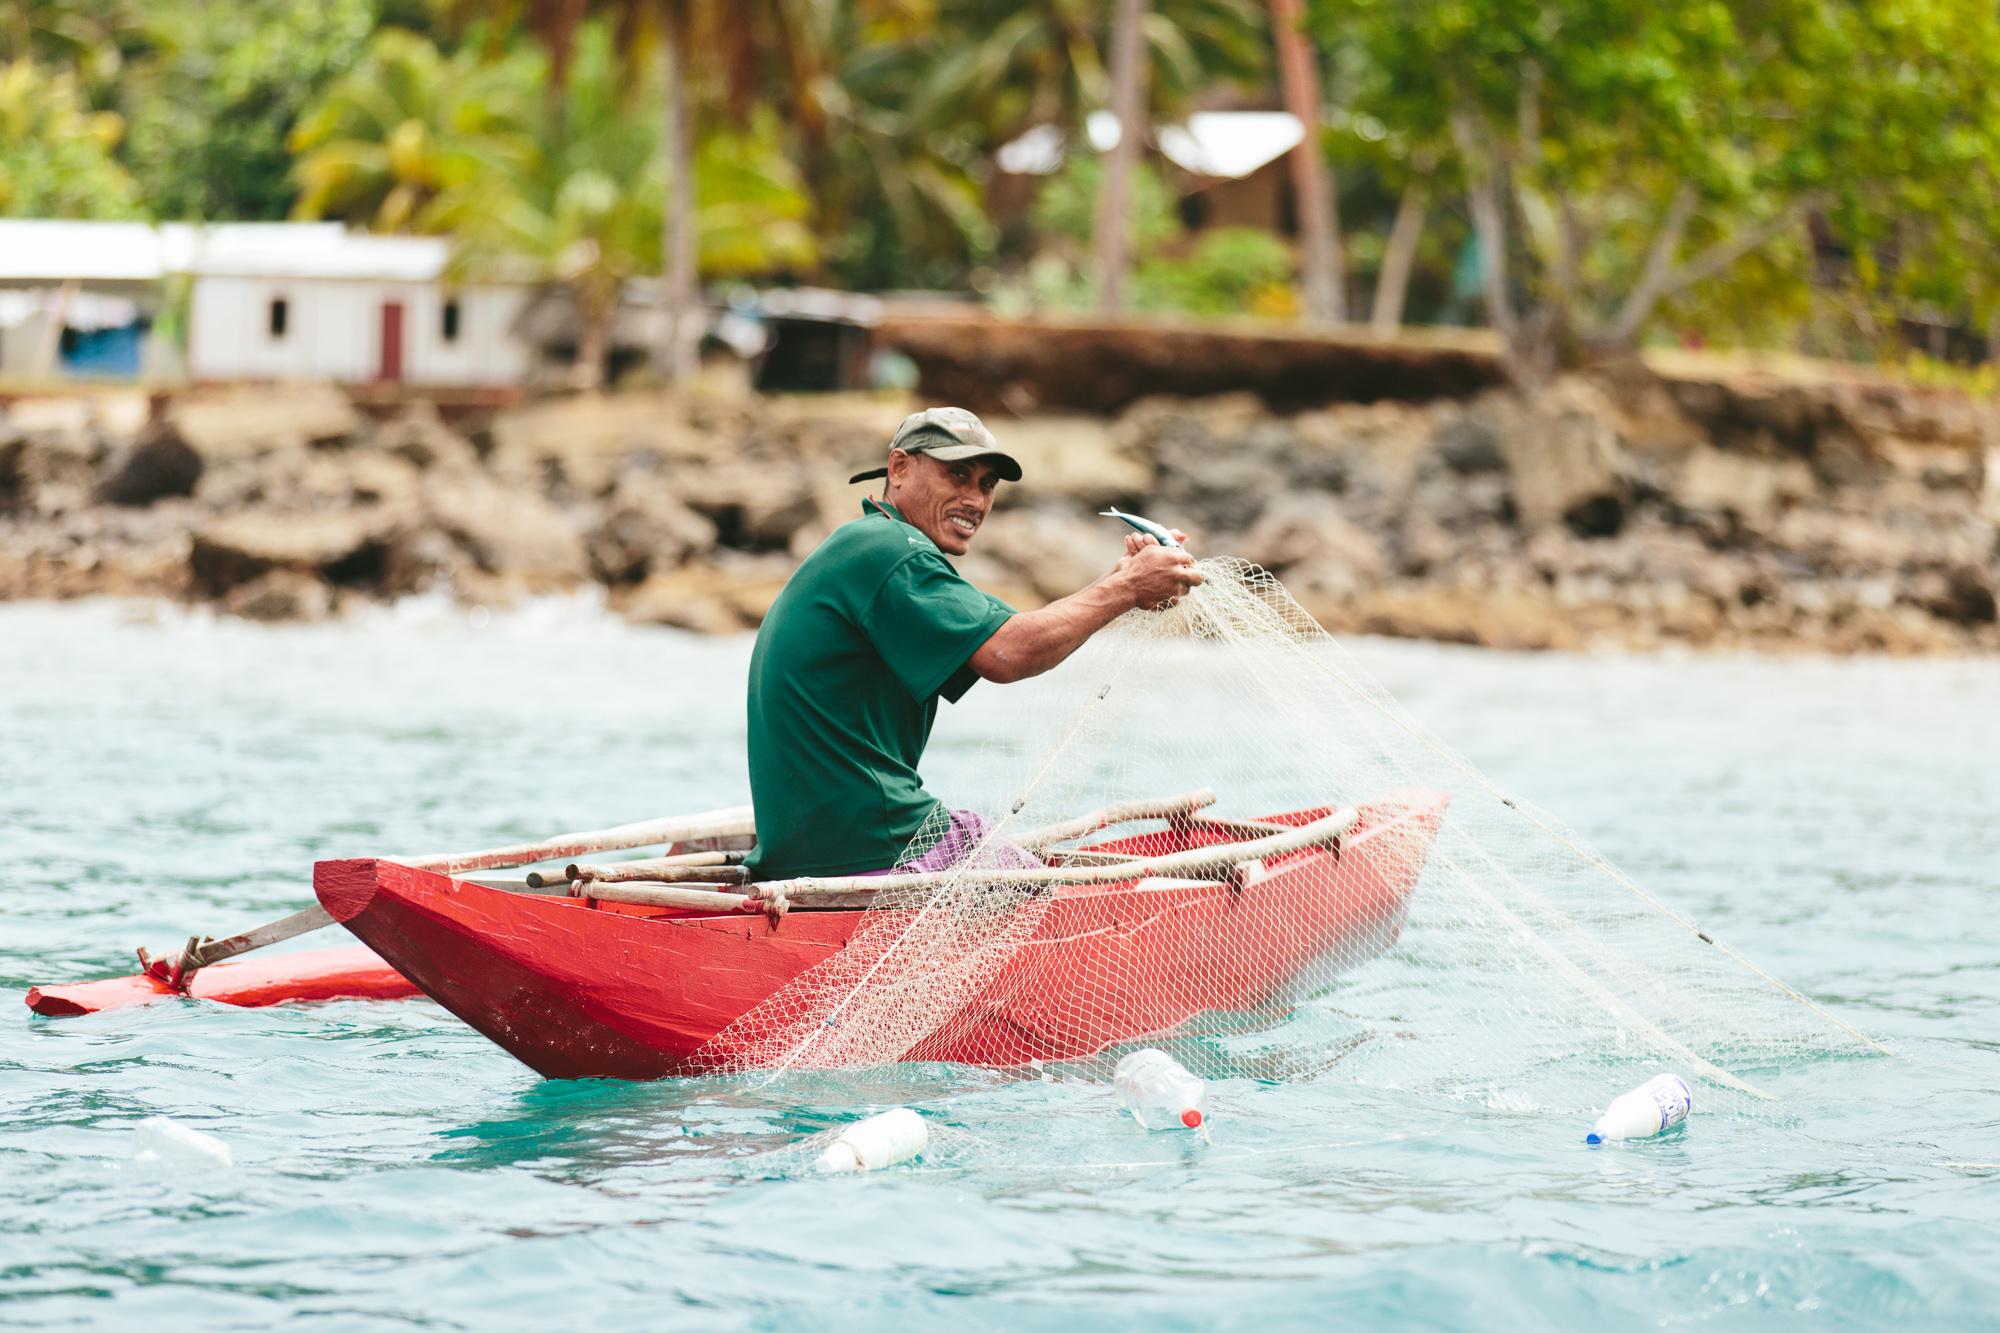 Outrigger Fishing Fiji - Kioa Island - The Remote Resort, Fiji Islands